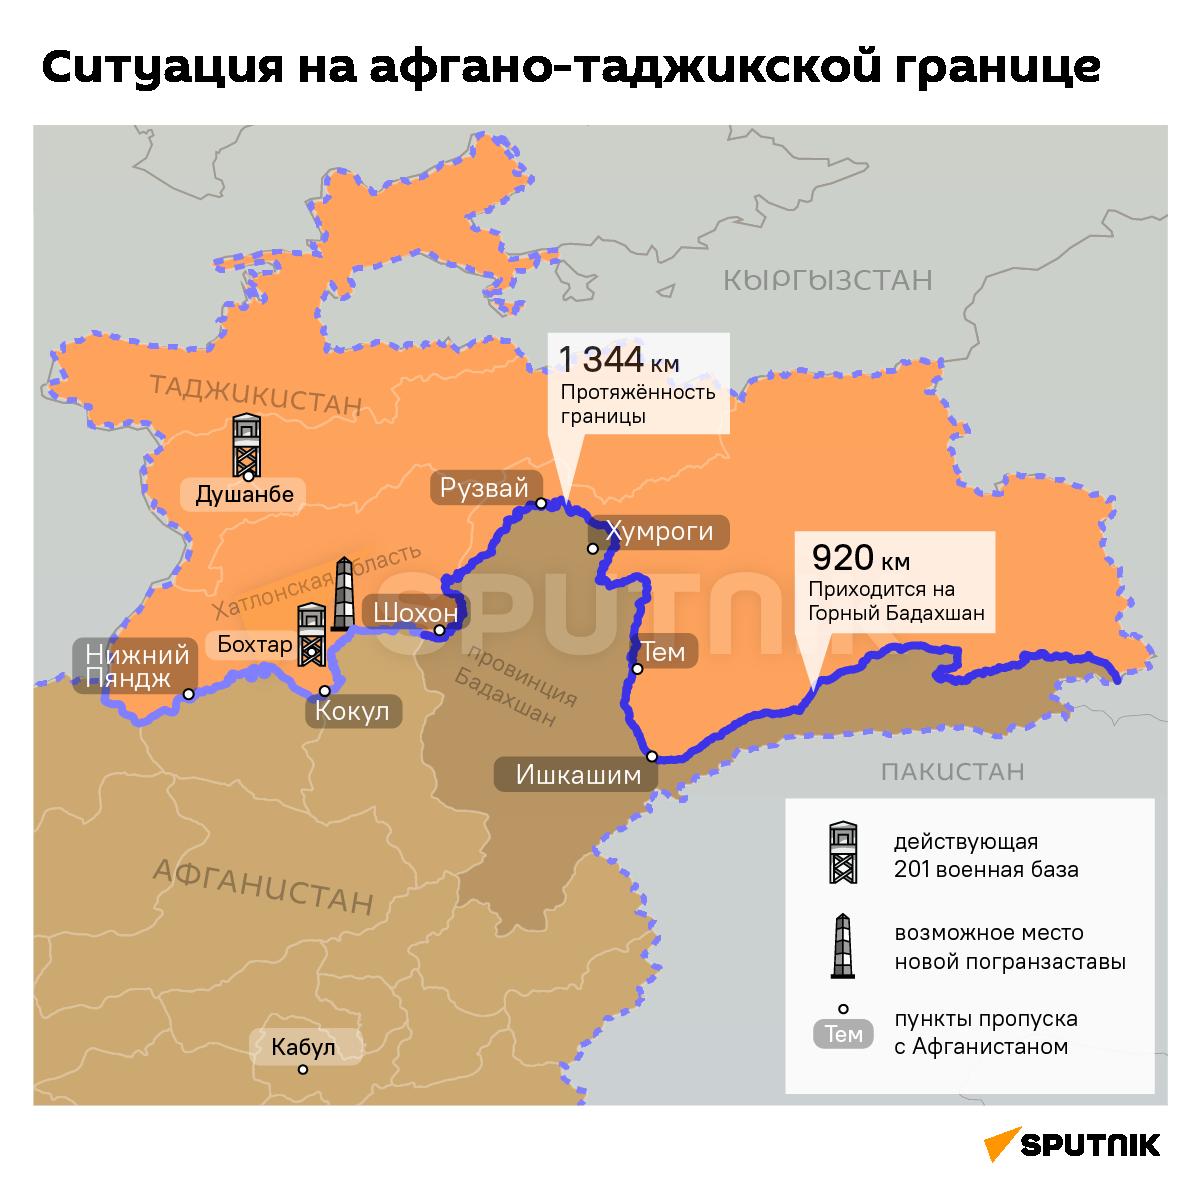 Ситуация на границе Таджикистана и Афганистана - Sputnik Таджикистан